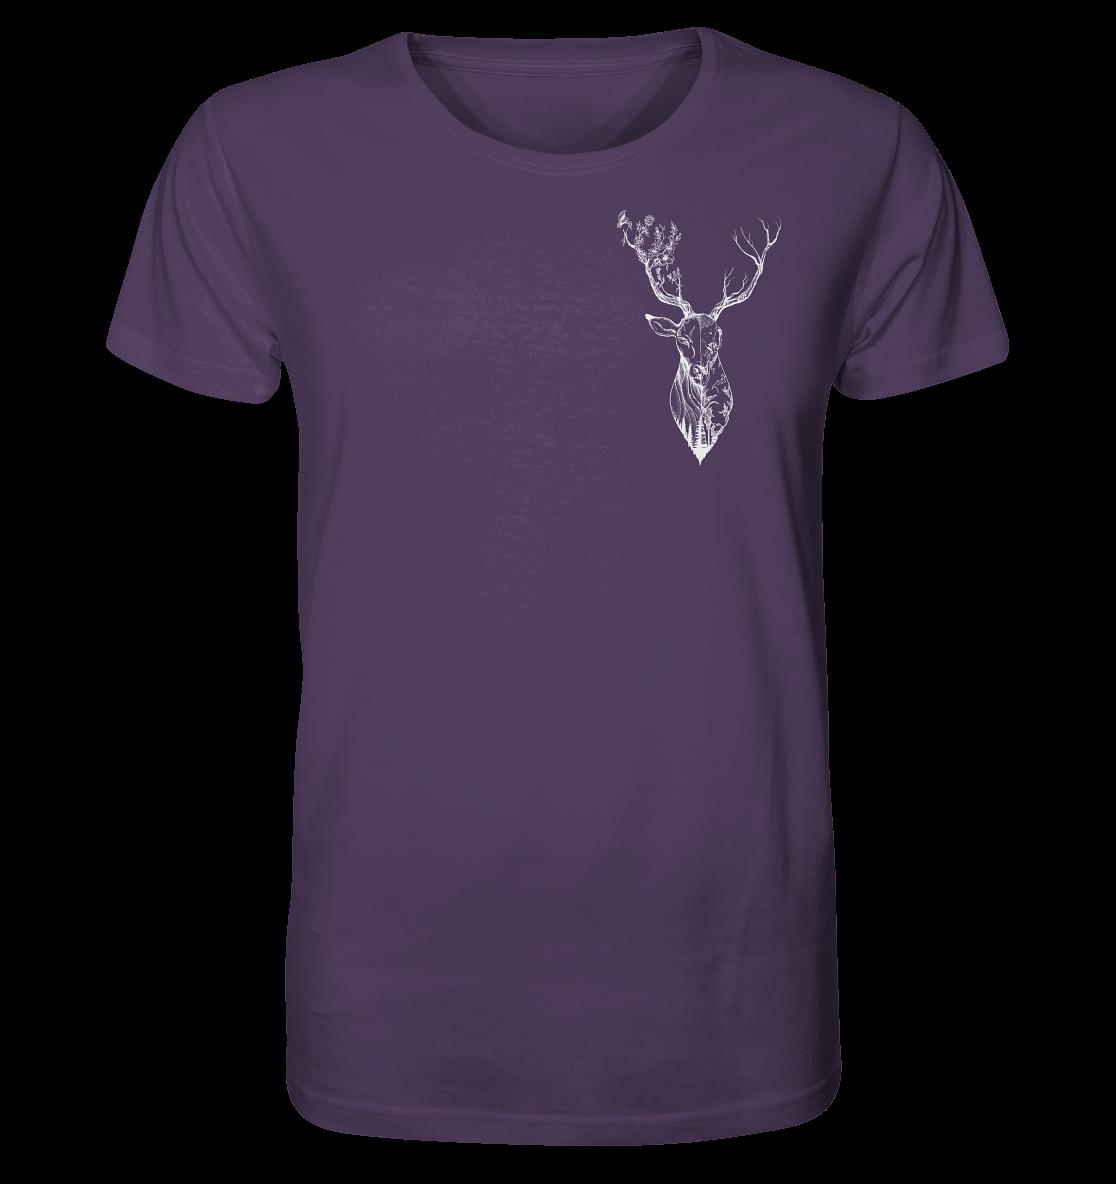 front-organic-shirt-523f5f-1116x-6.png